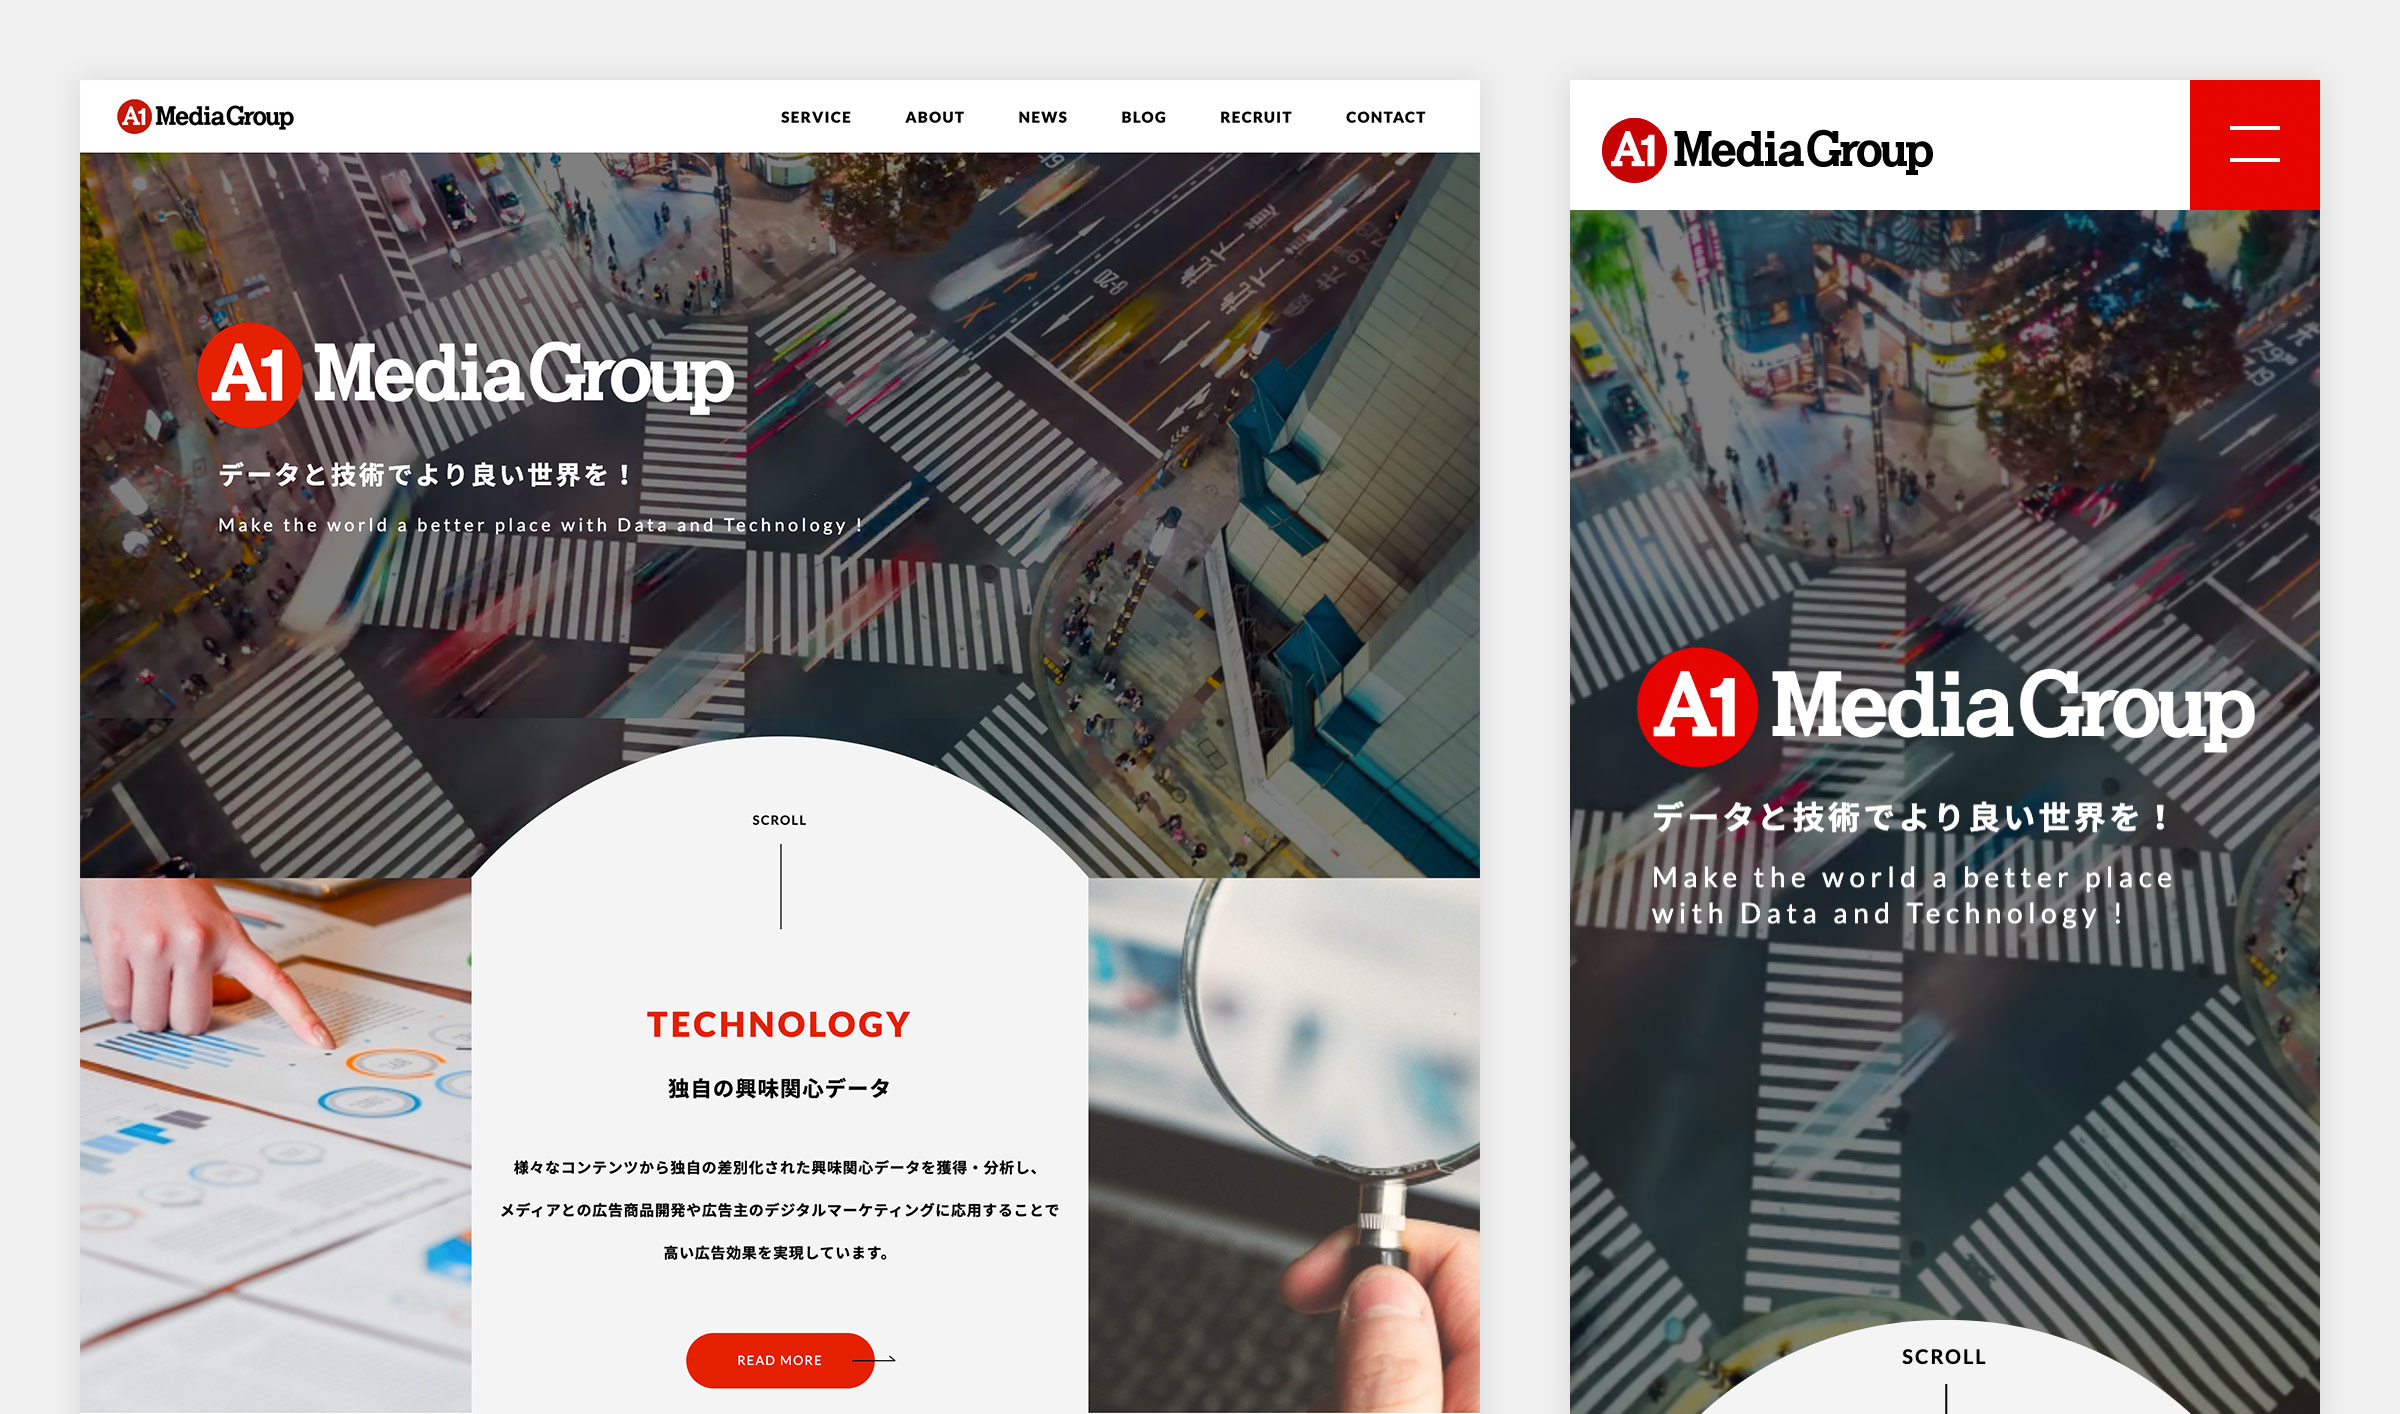 株式会社A1 Media Group